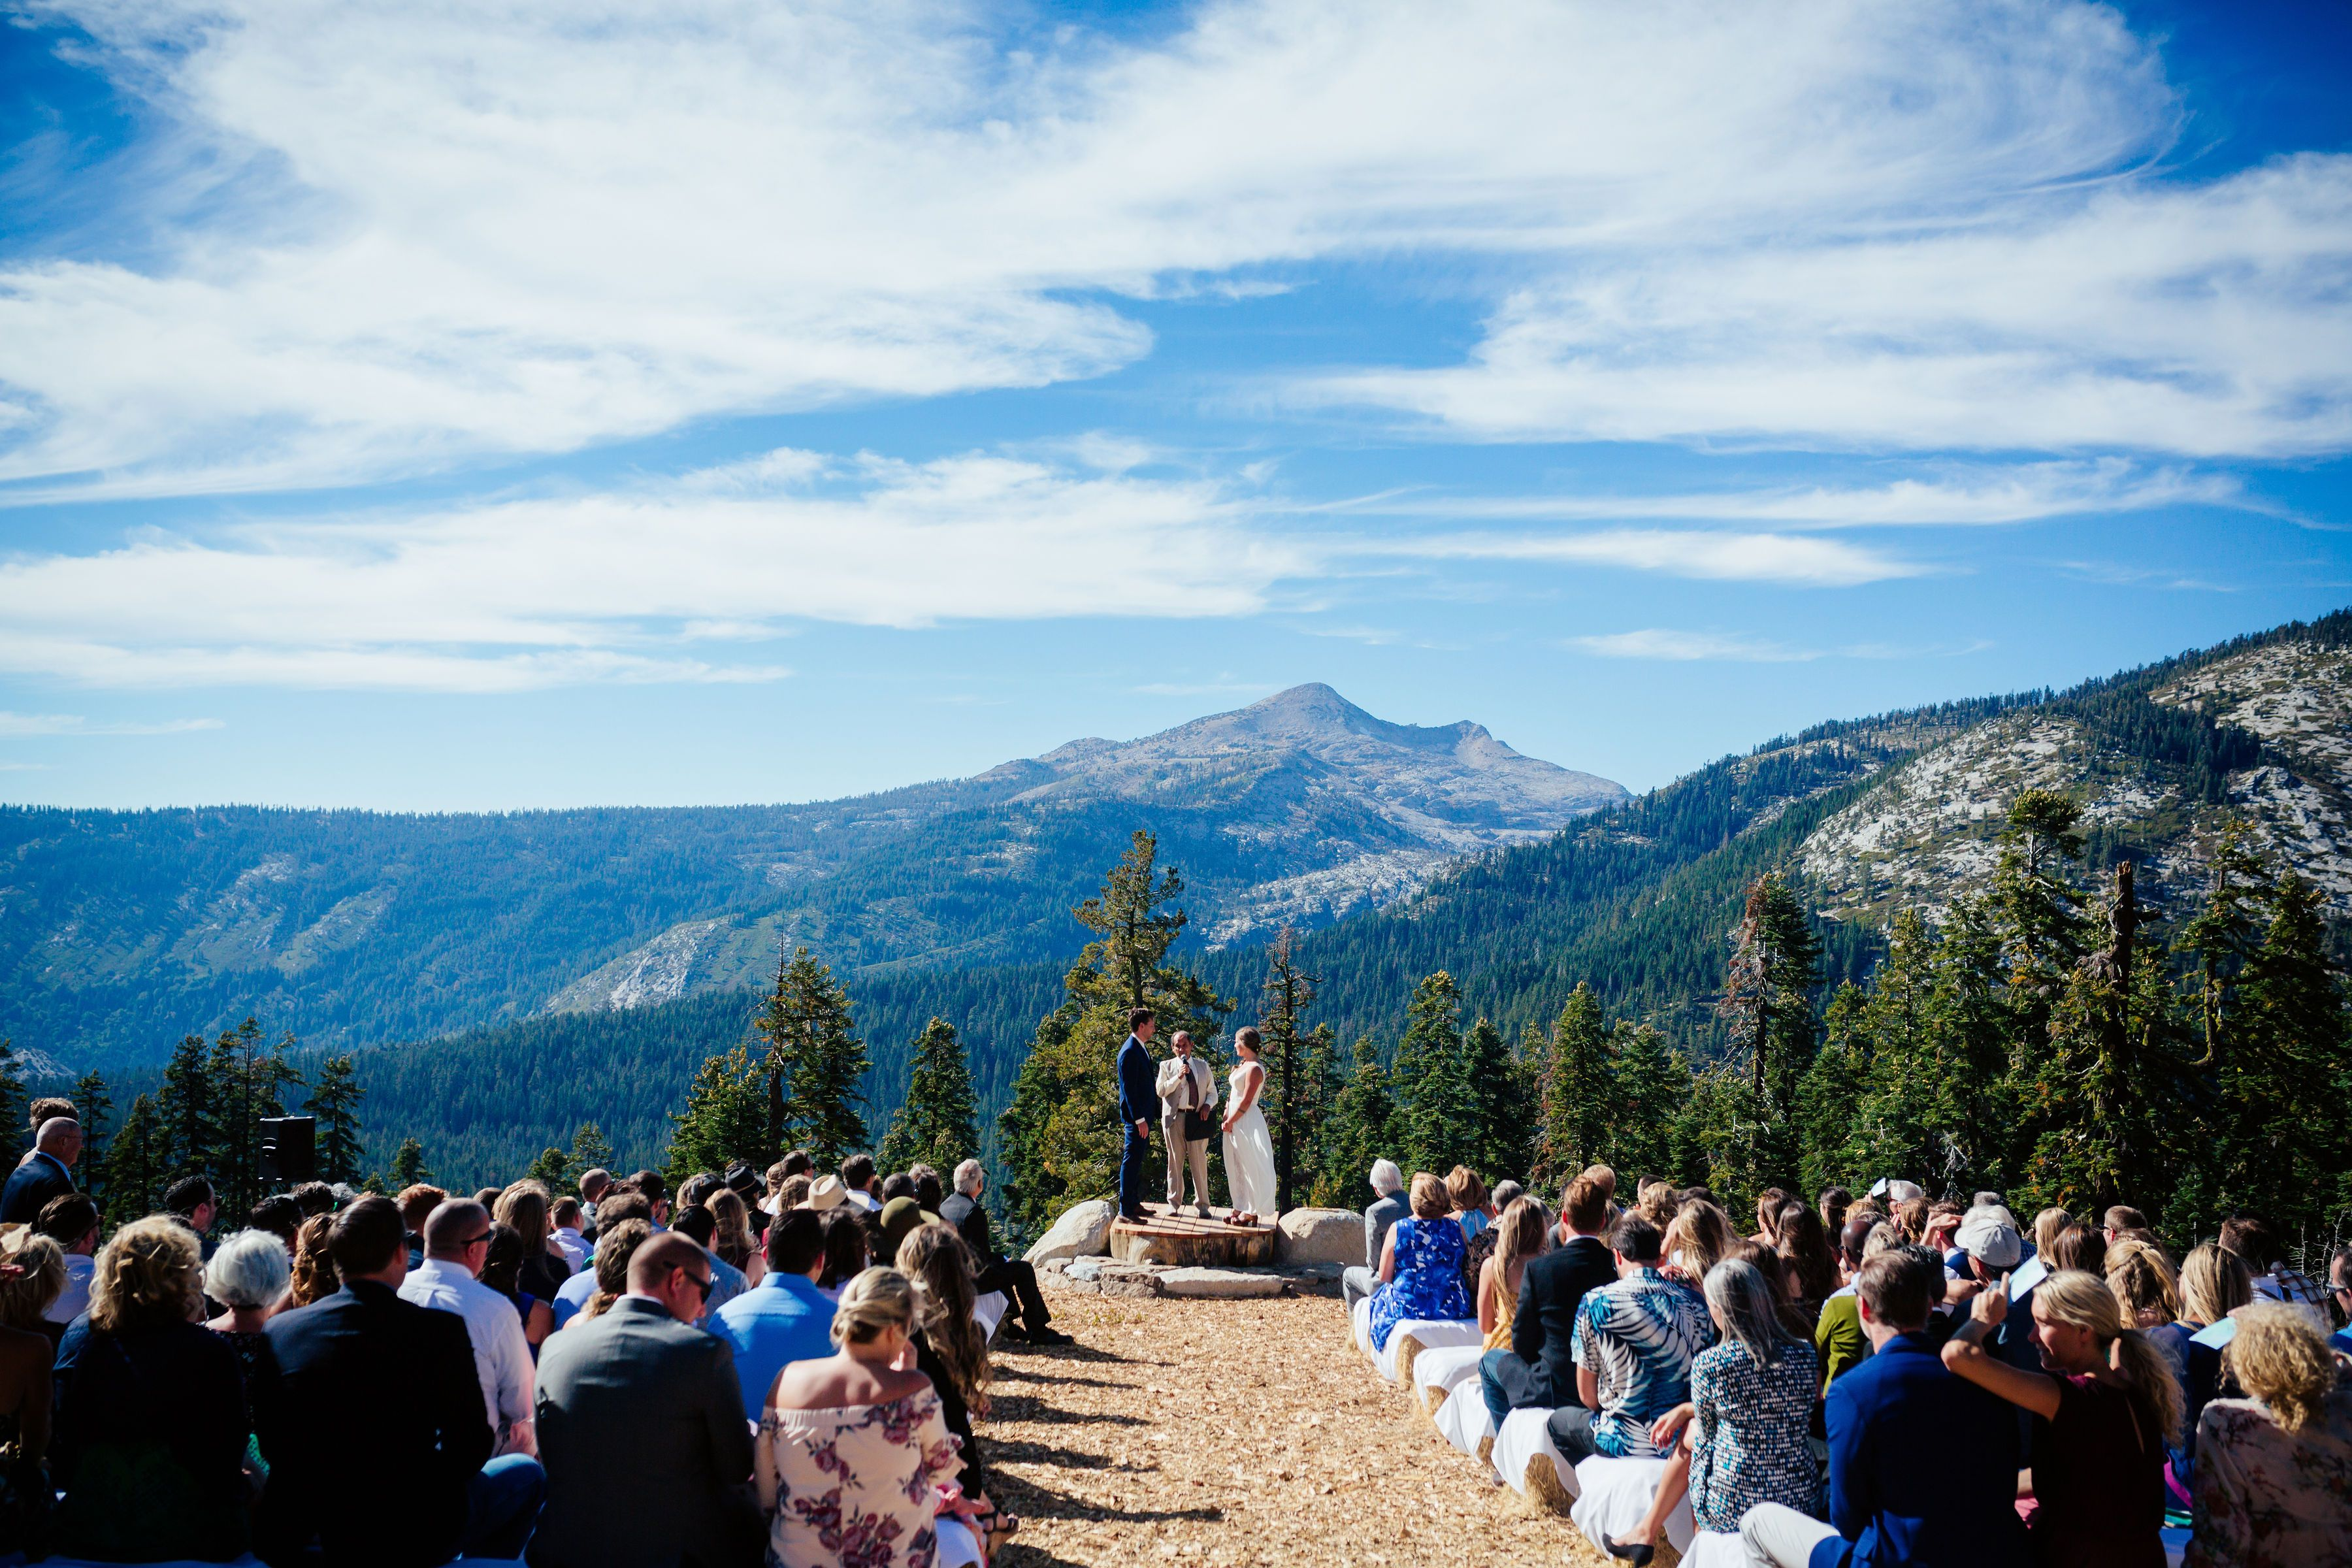 Mountain Top Vista For A Wedding Ceremony Wedding Mountainwedding Views South Lake Tahoe Wedding Venues South Lake Tahoe Weddings Lake Tahoe Wedding Venues